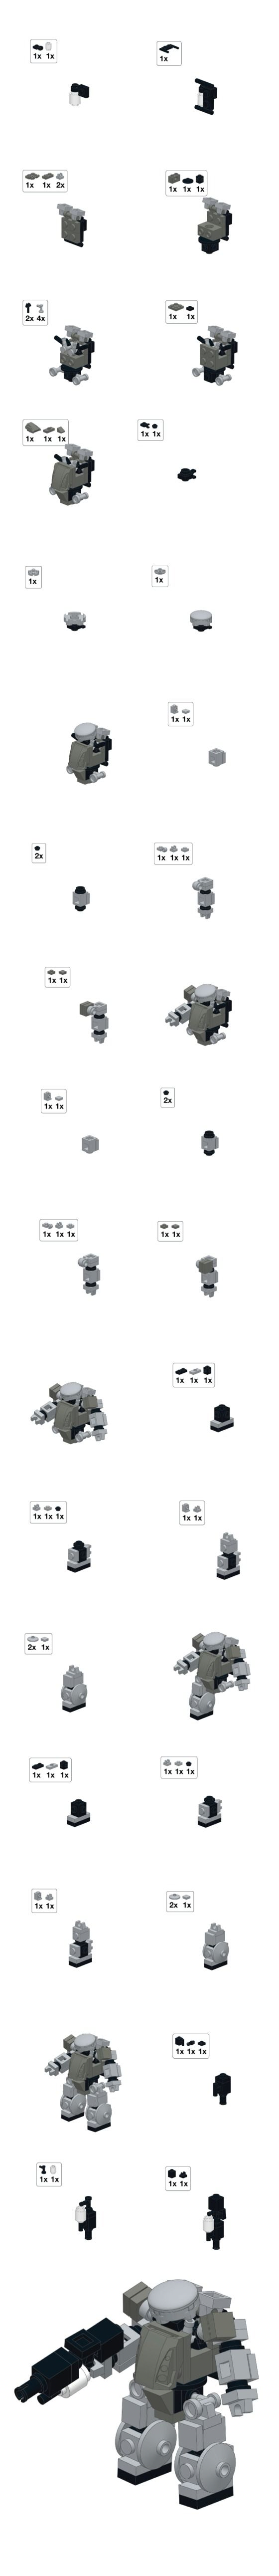 Mobile Frame Zero Chub - breakdown plan